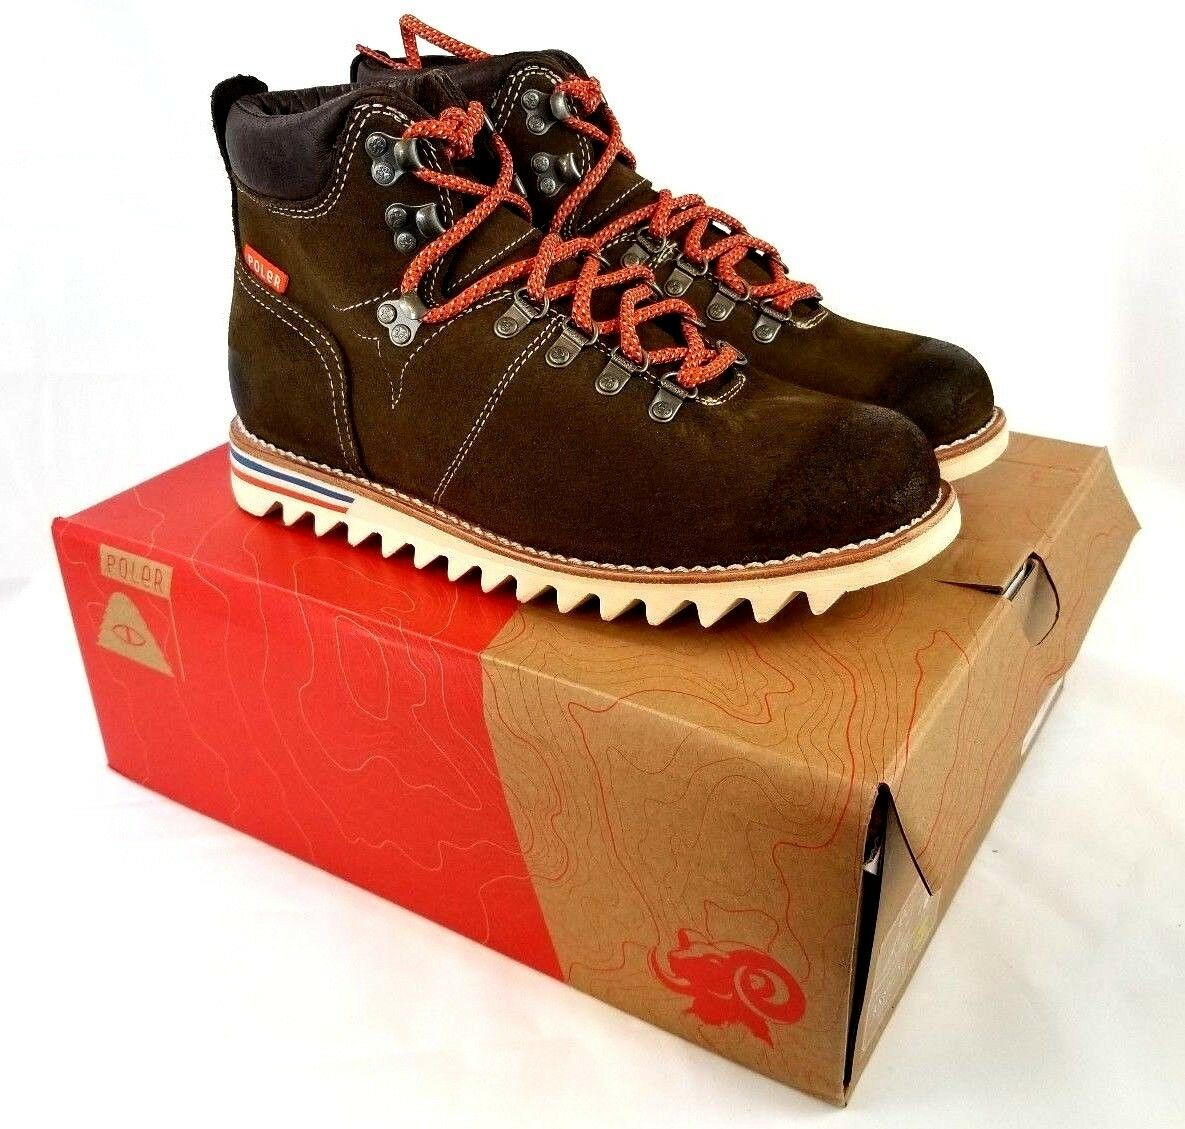 ROCKY Men's X Poler Original Hiker 5  Boots Brown US 10 EU 43 UK 9 CM 28 Z457